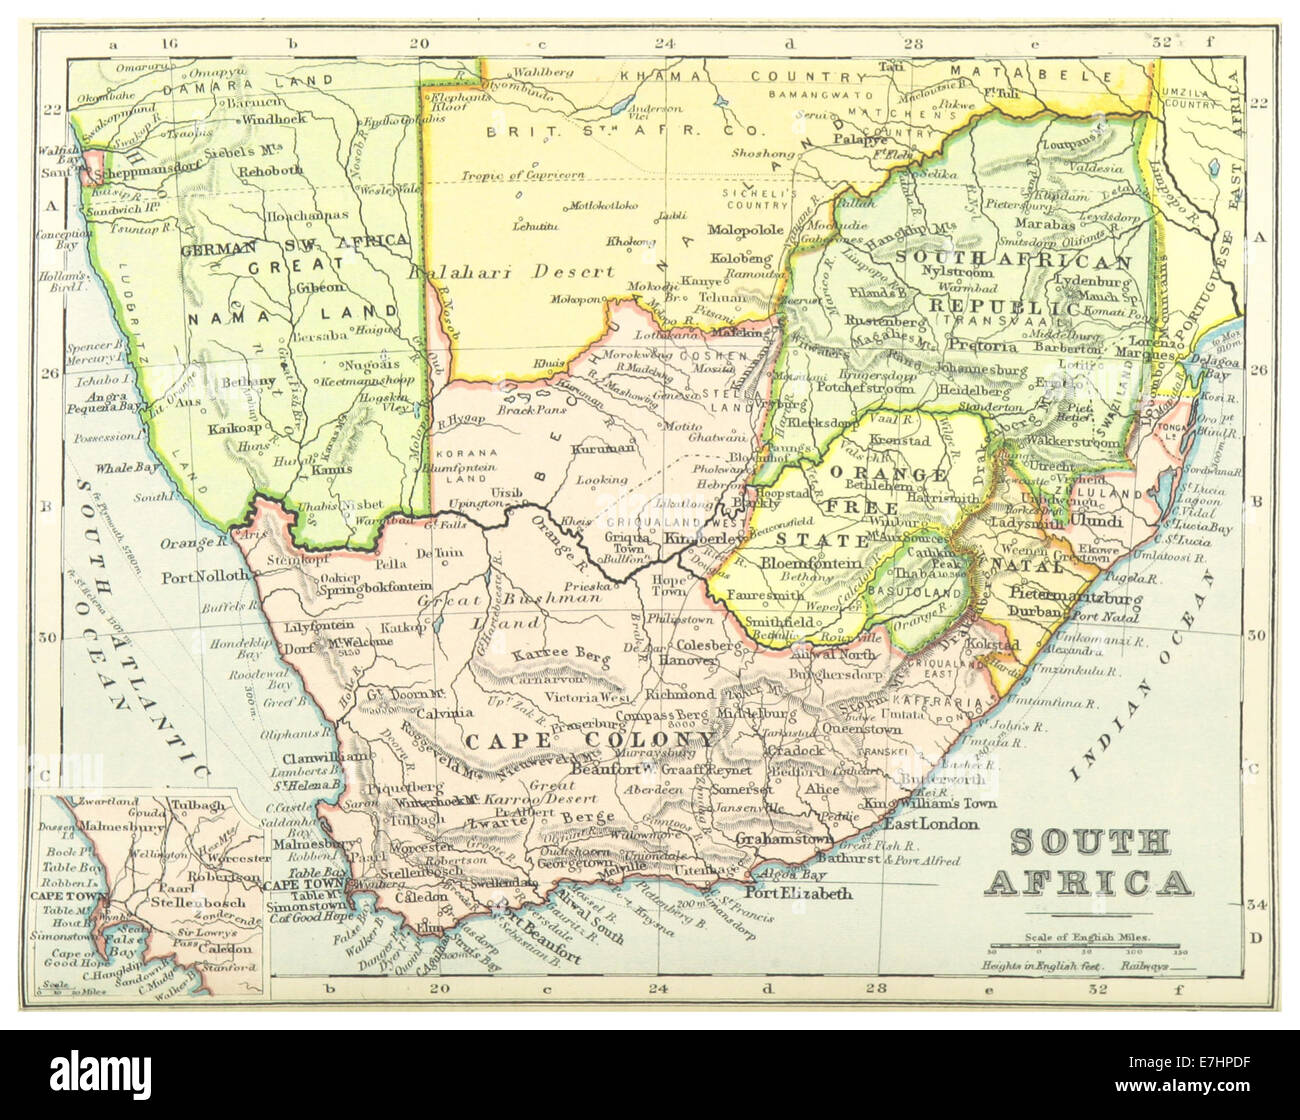 Südafrika Karte Pdf.Karte Von South Africa Stockfotos Karte Von South Africa Bilder